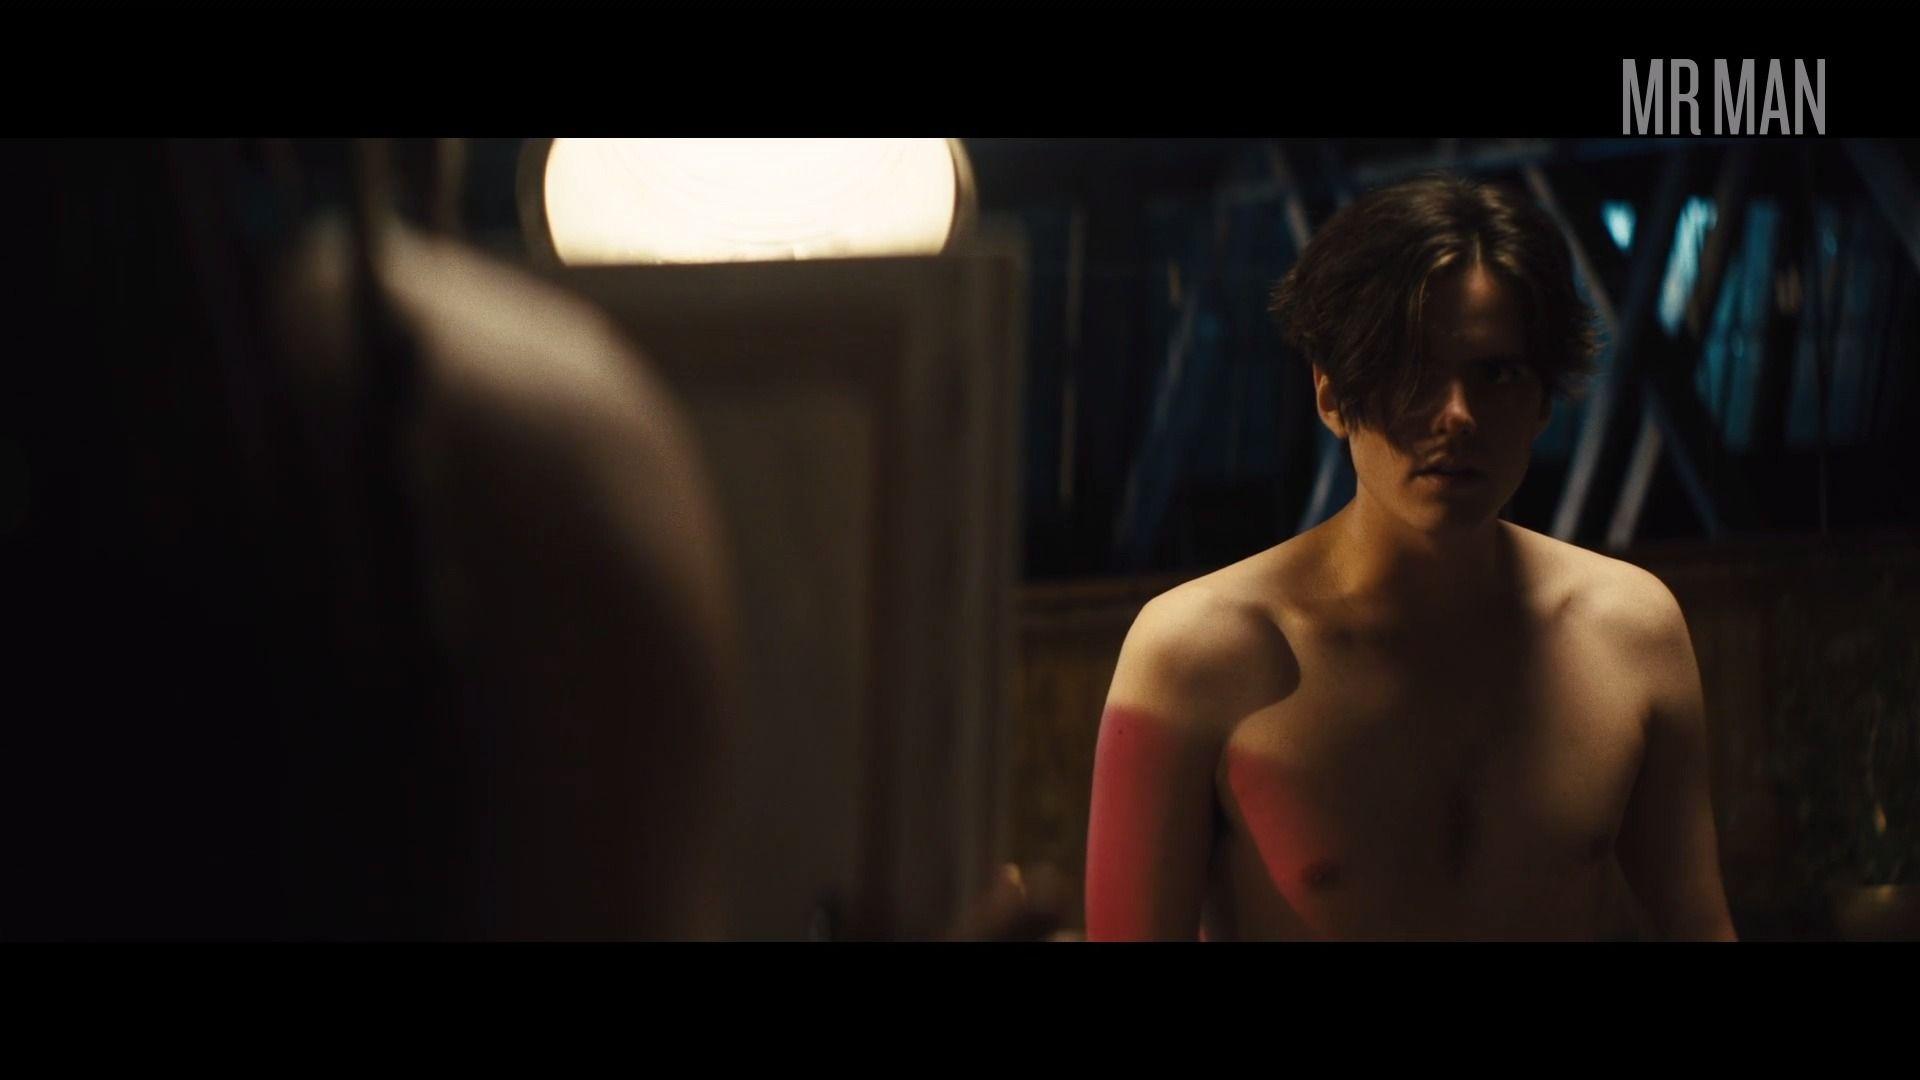 Real Nude Movie